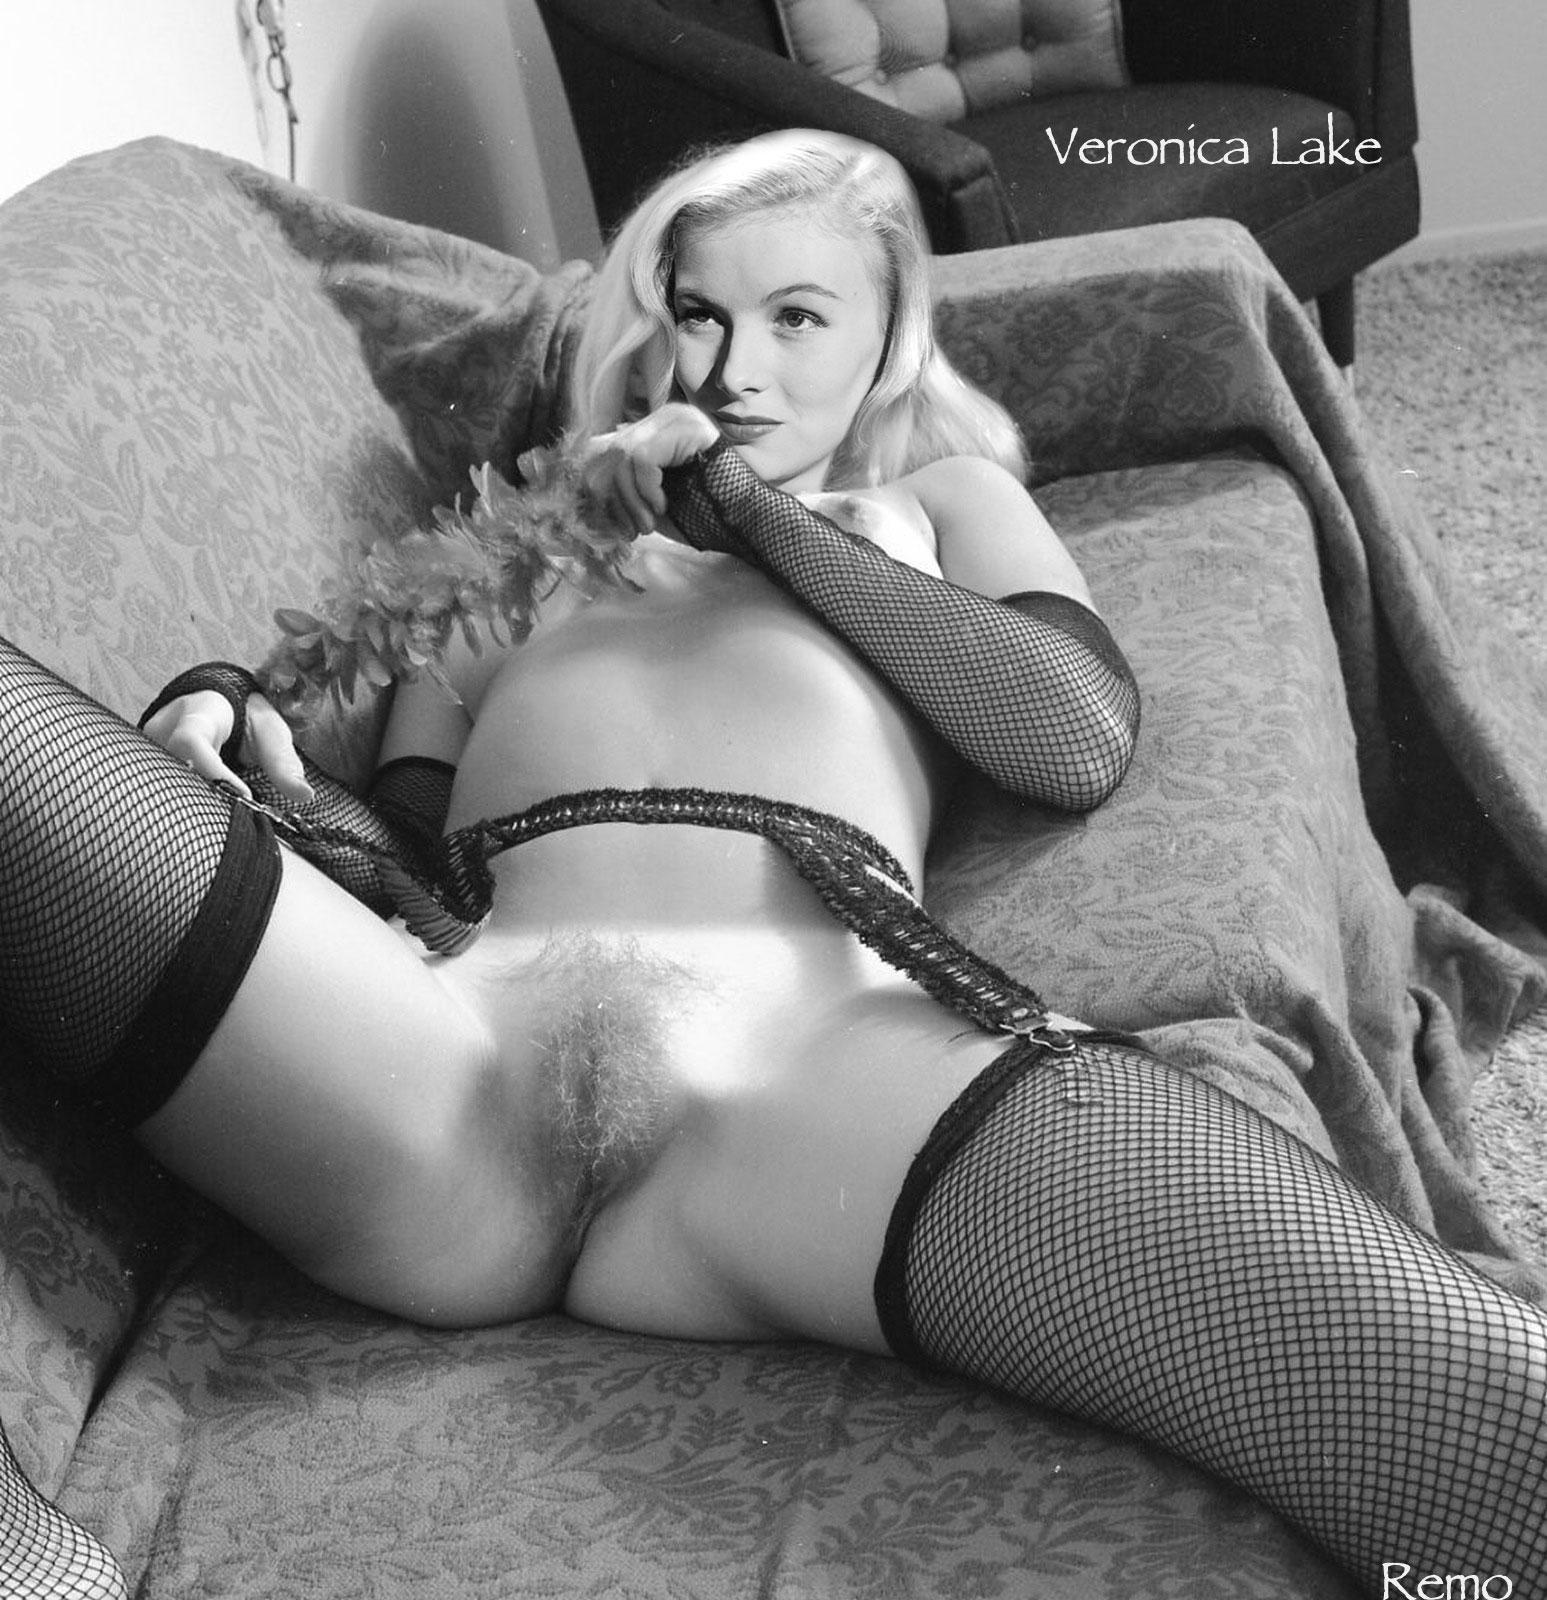 Veronica fake nude